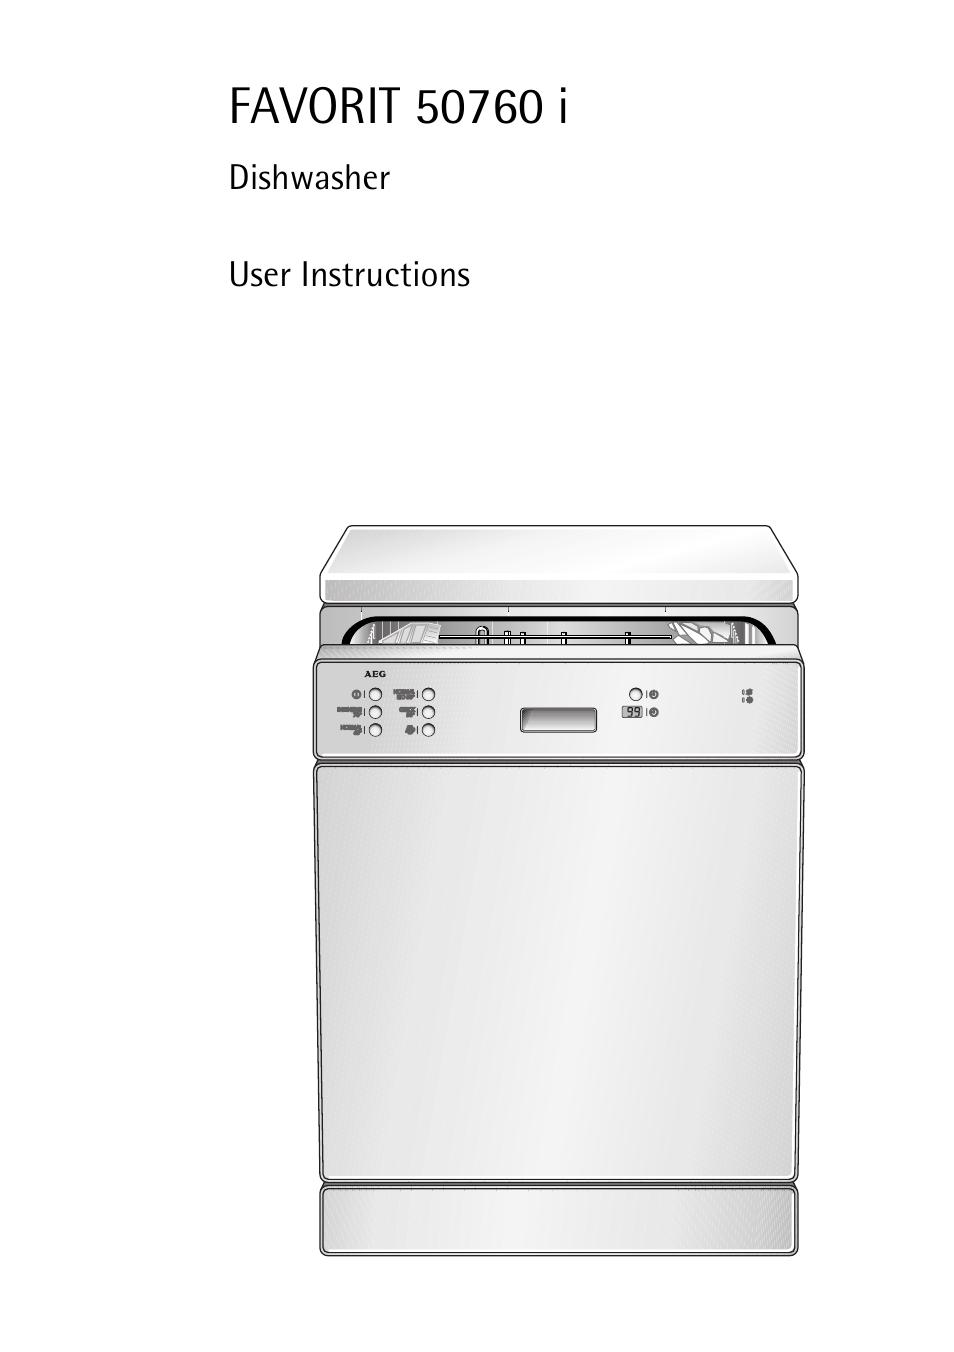 aeg favorit 50760 i user manual 44 pages rh manualsdir com aeg dishwasher installation instructions aeg favorit 443 dishwasher user manual